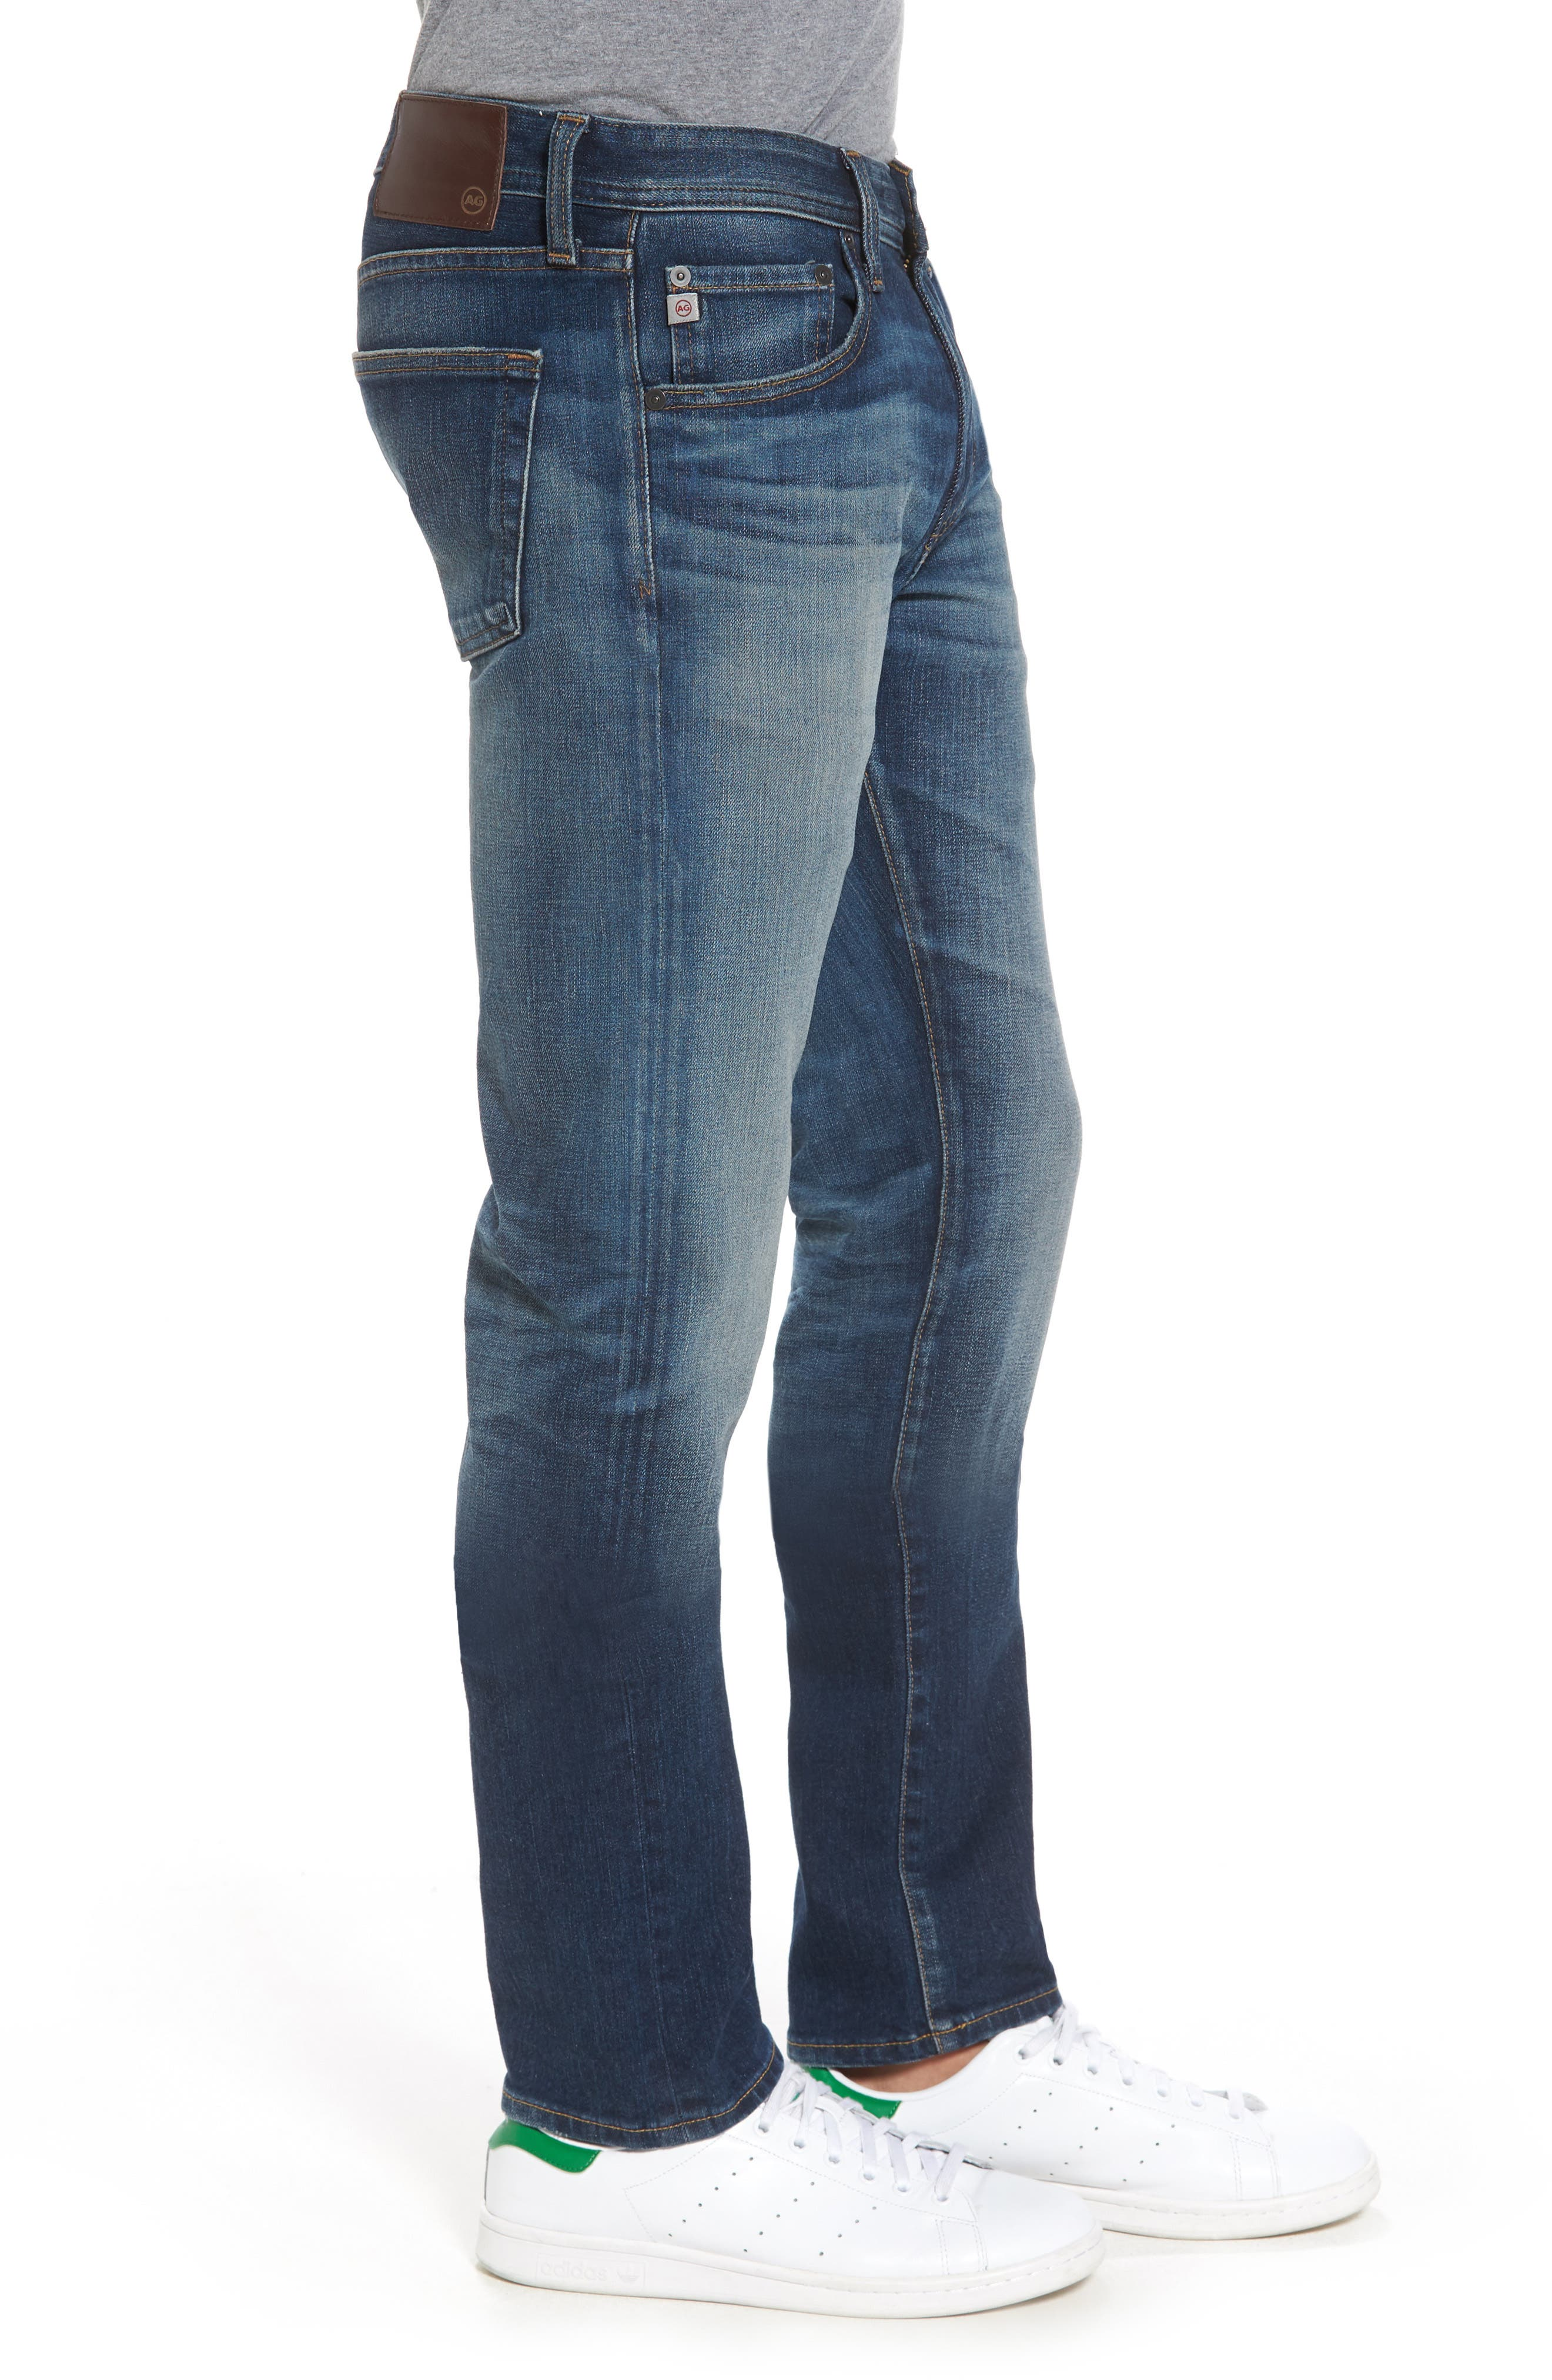 Tellis Slim Fit Jeans,                             Alternate thumbnail 3, color,                             496